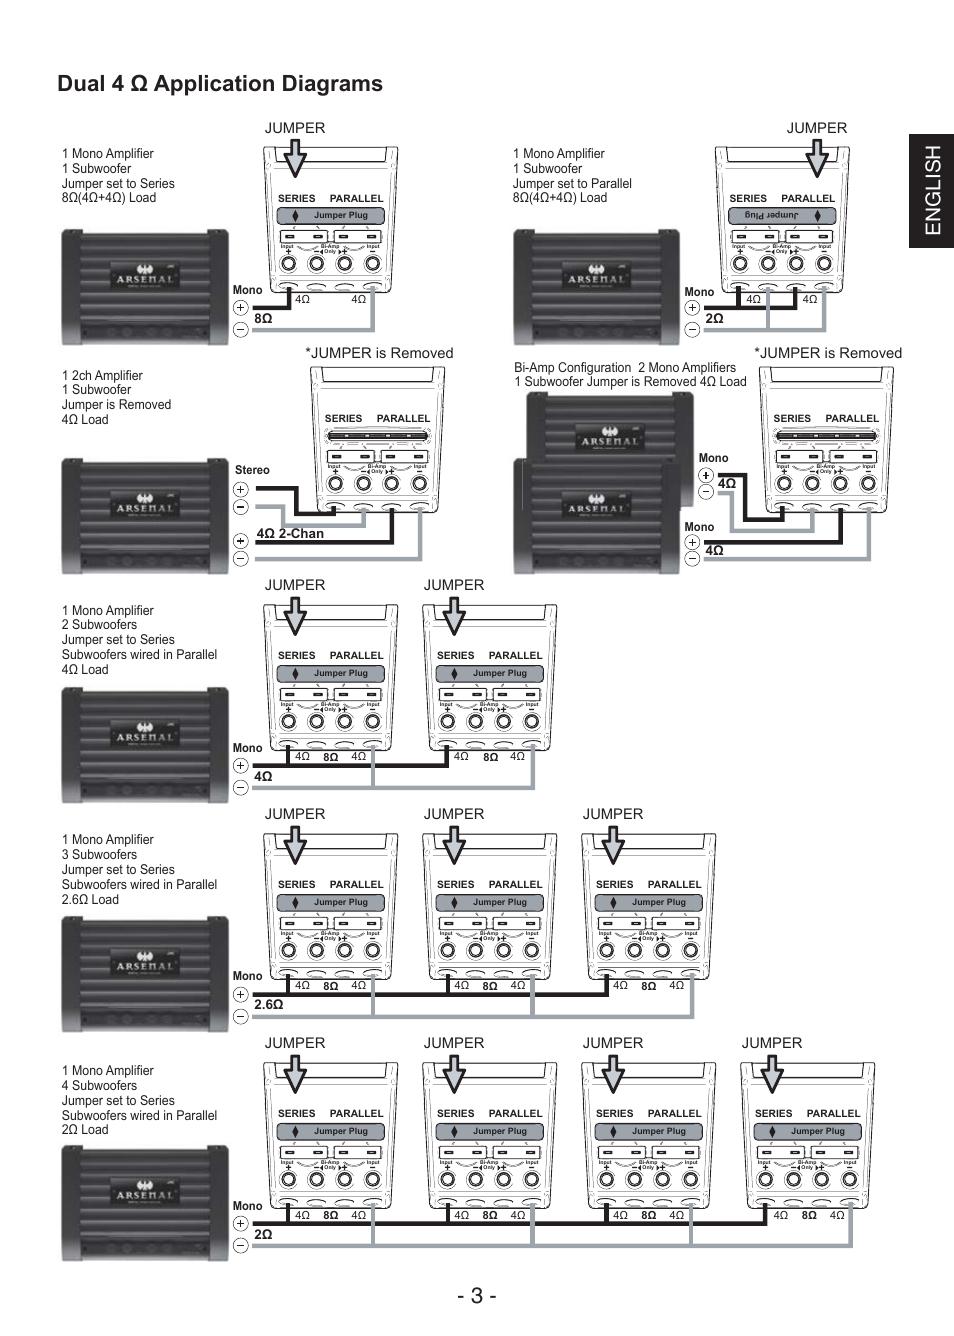 Jvc Arsenal Wiring Diagram Electrical Diagrams Avx 900 Dual 4 Application 3 English Jumper Cs Rh Manualsdir Com